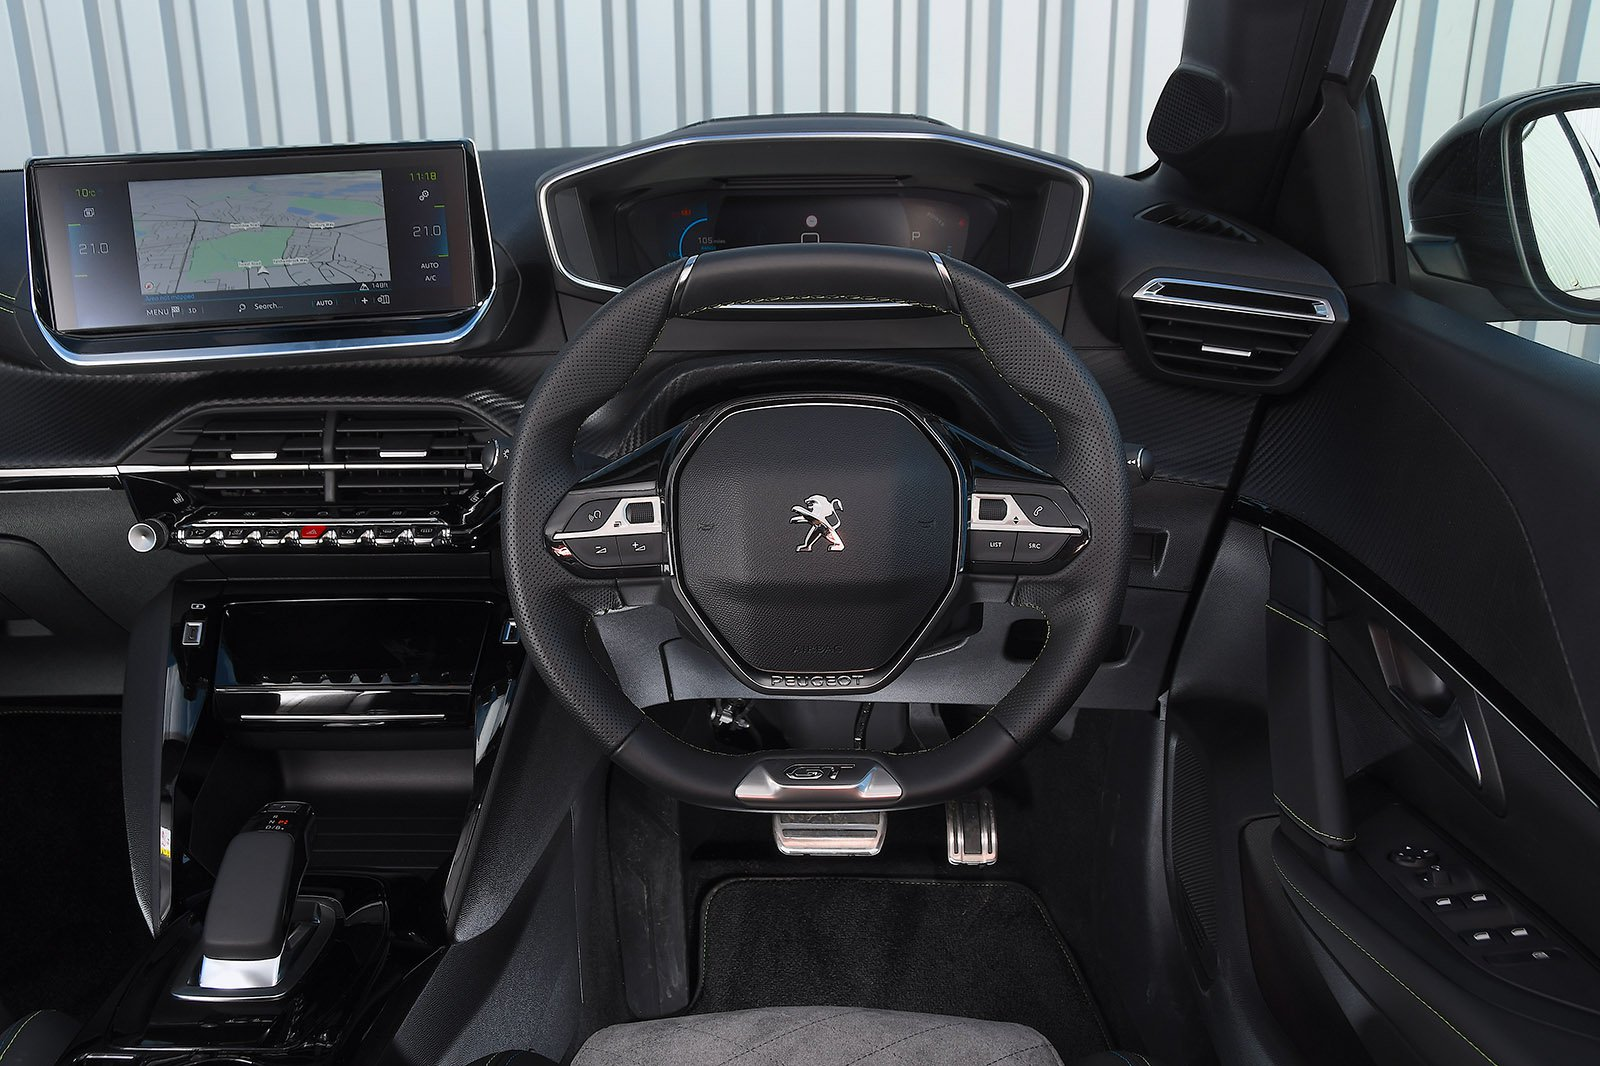 Peugeot e-208 2020 RHD dashboard